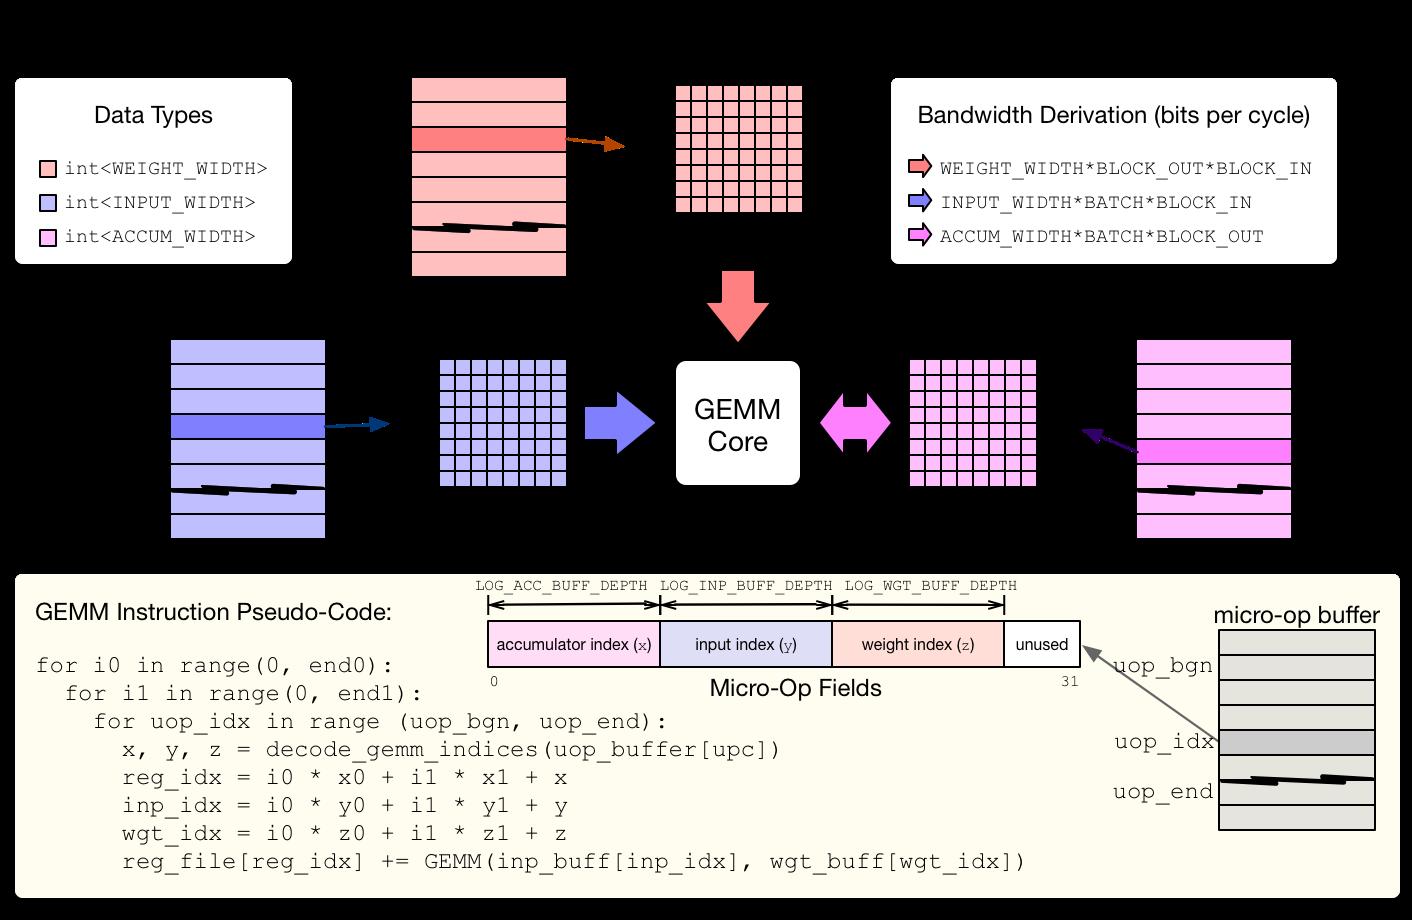 http://raw.githubusercontent.com/uwsaml/web-data/master/vta/developer/gemm_core.png